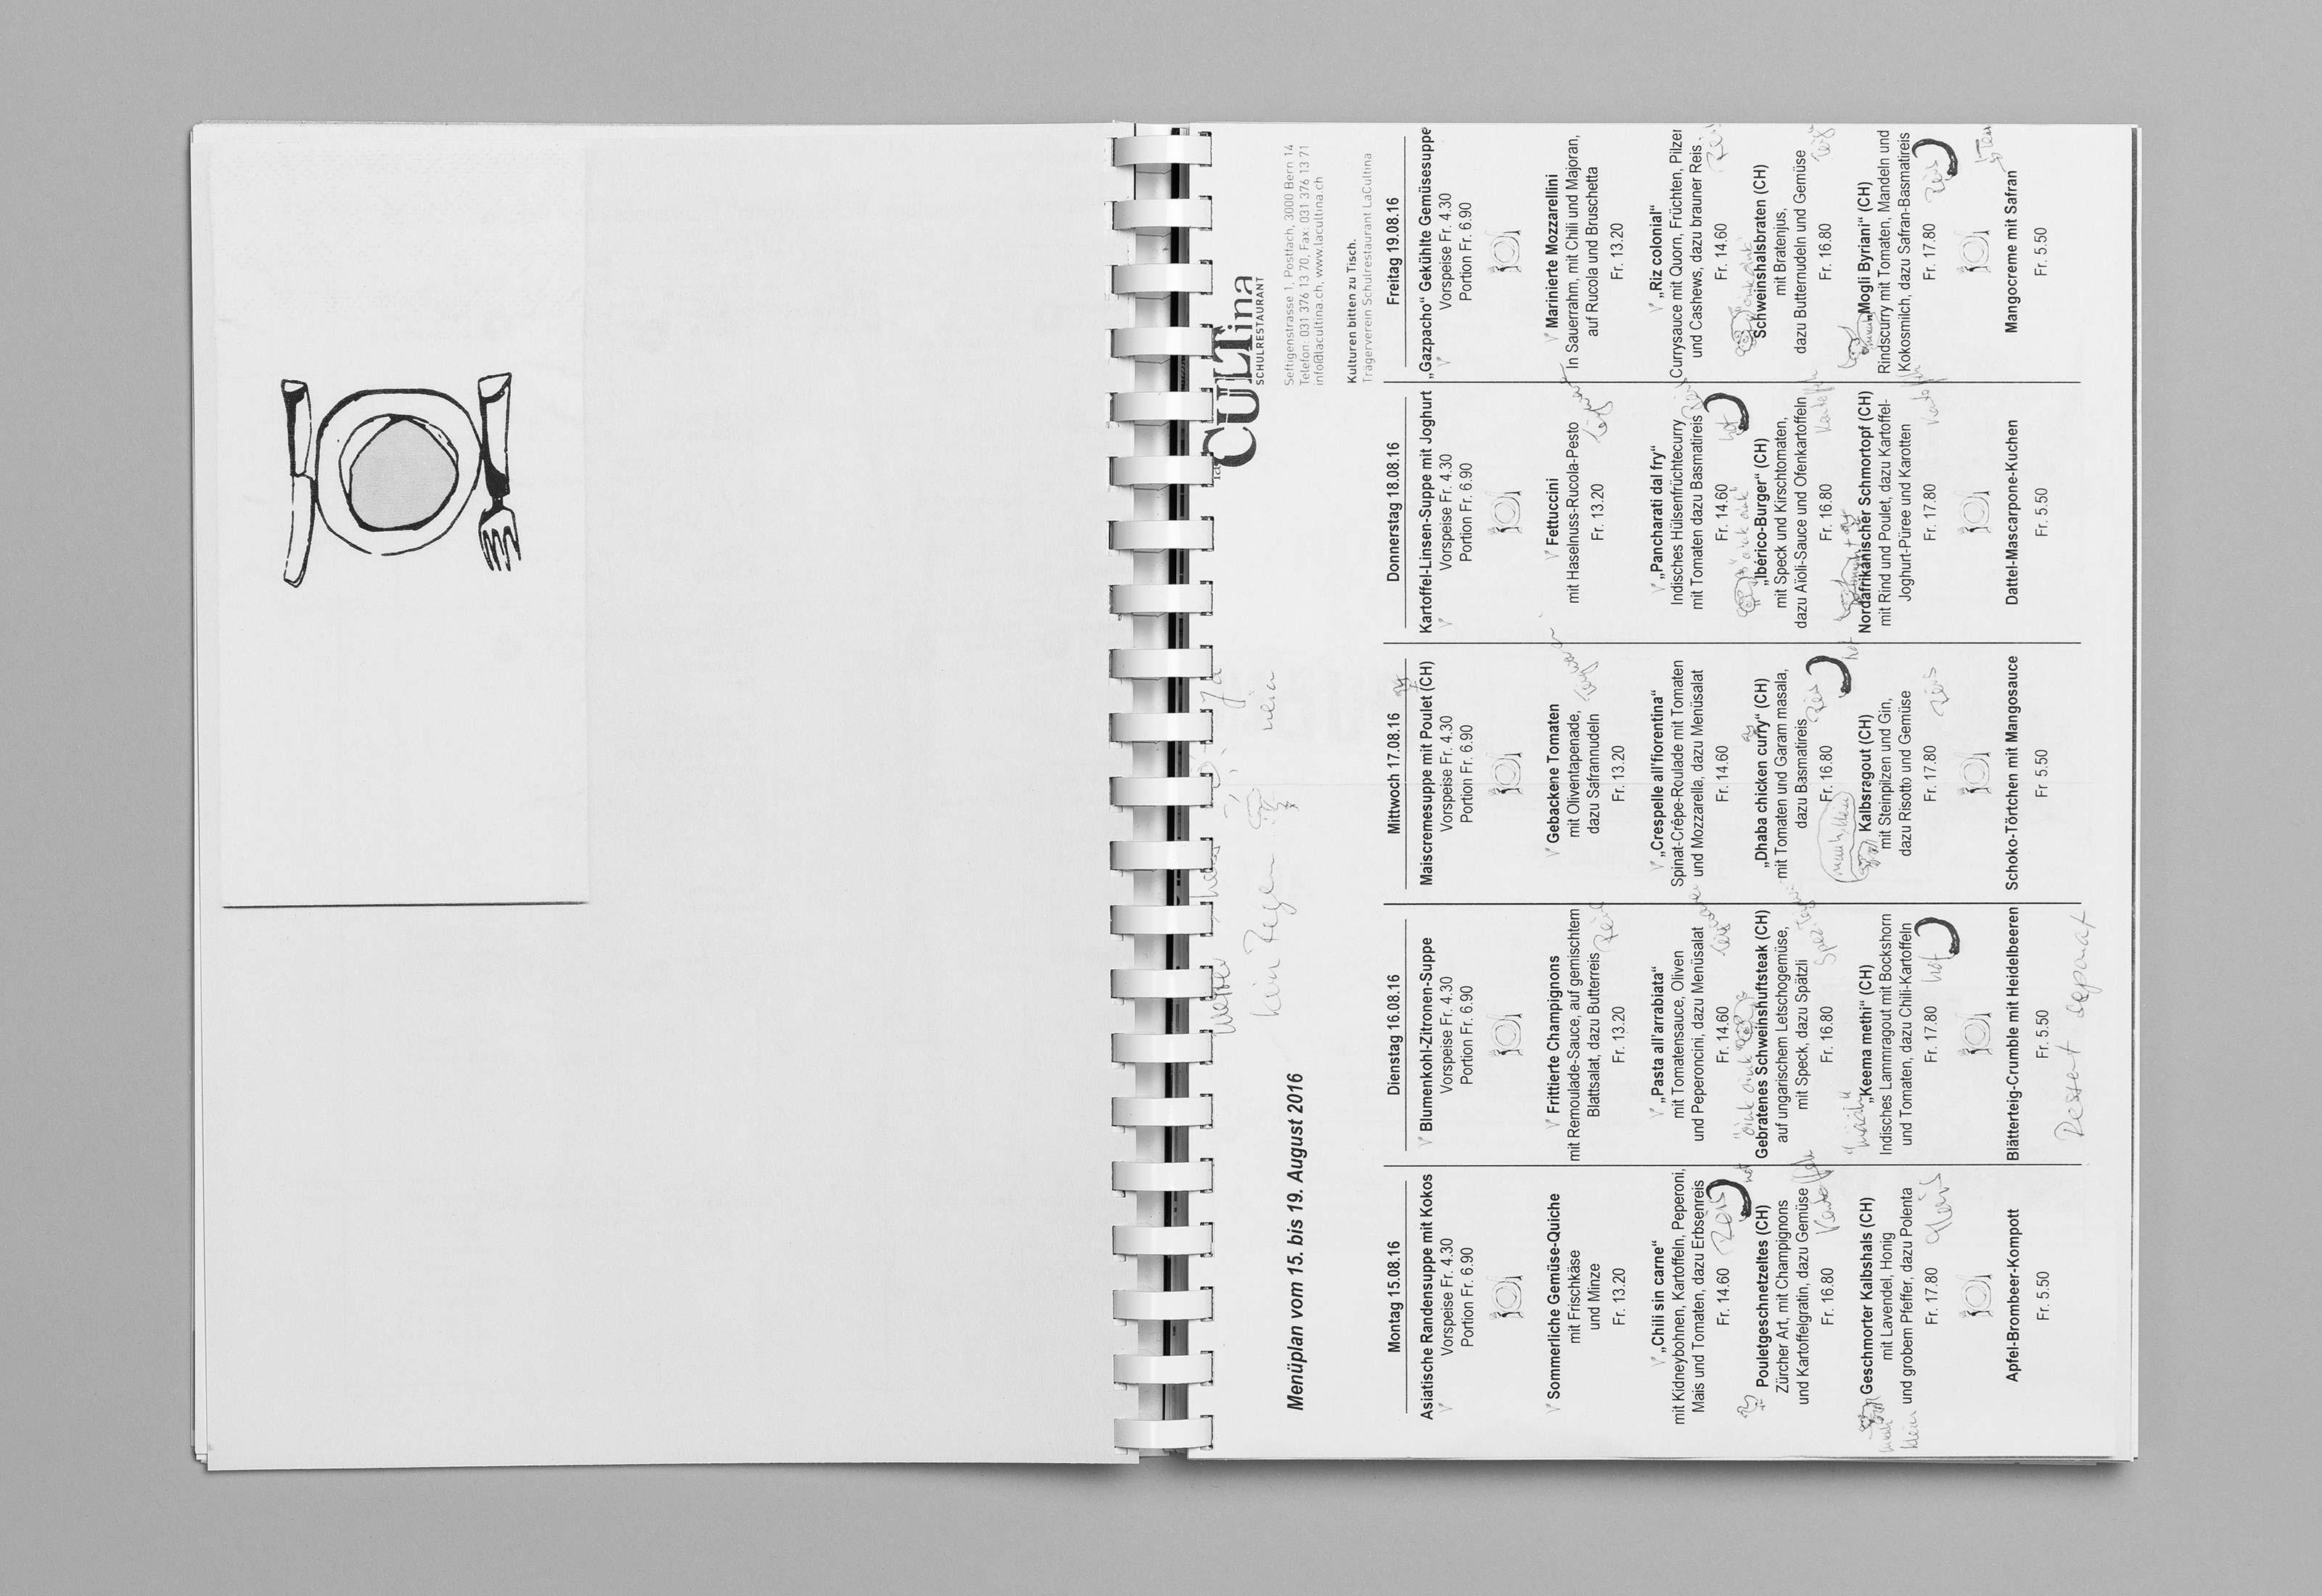 Sommerakademie im Zentrum Paul Klee 2016 – Publikation Thomas Hirschhorn, 06  ©Atelier Pol